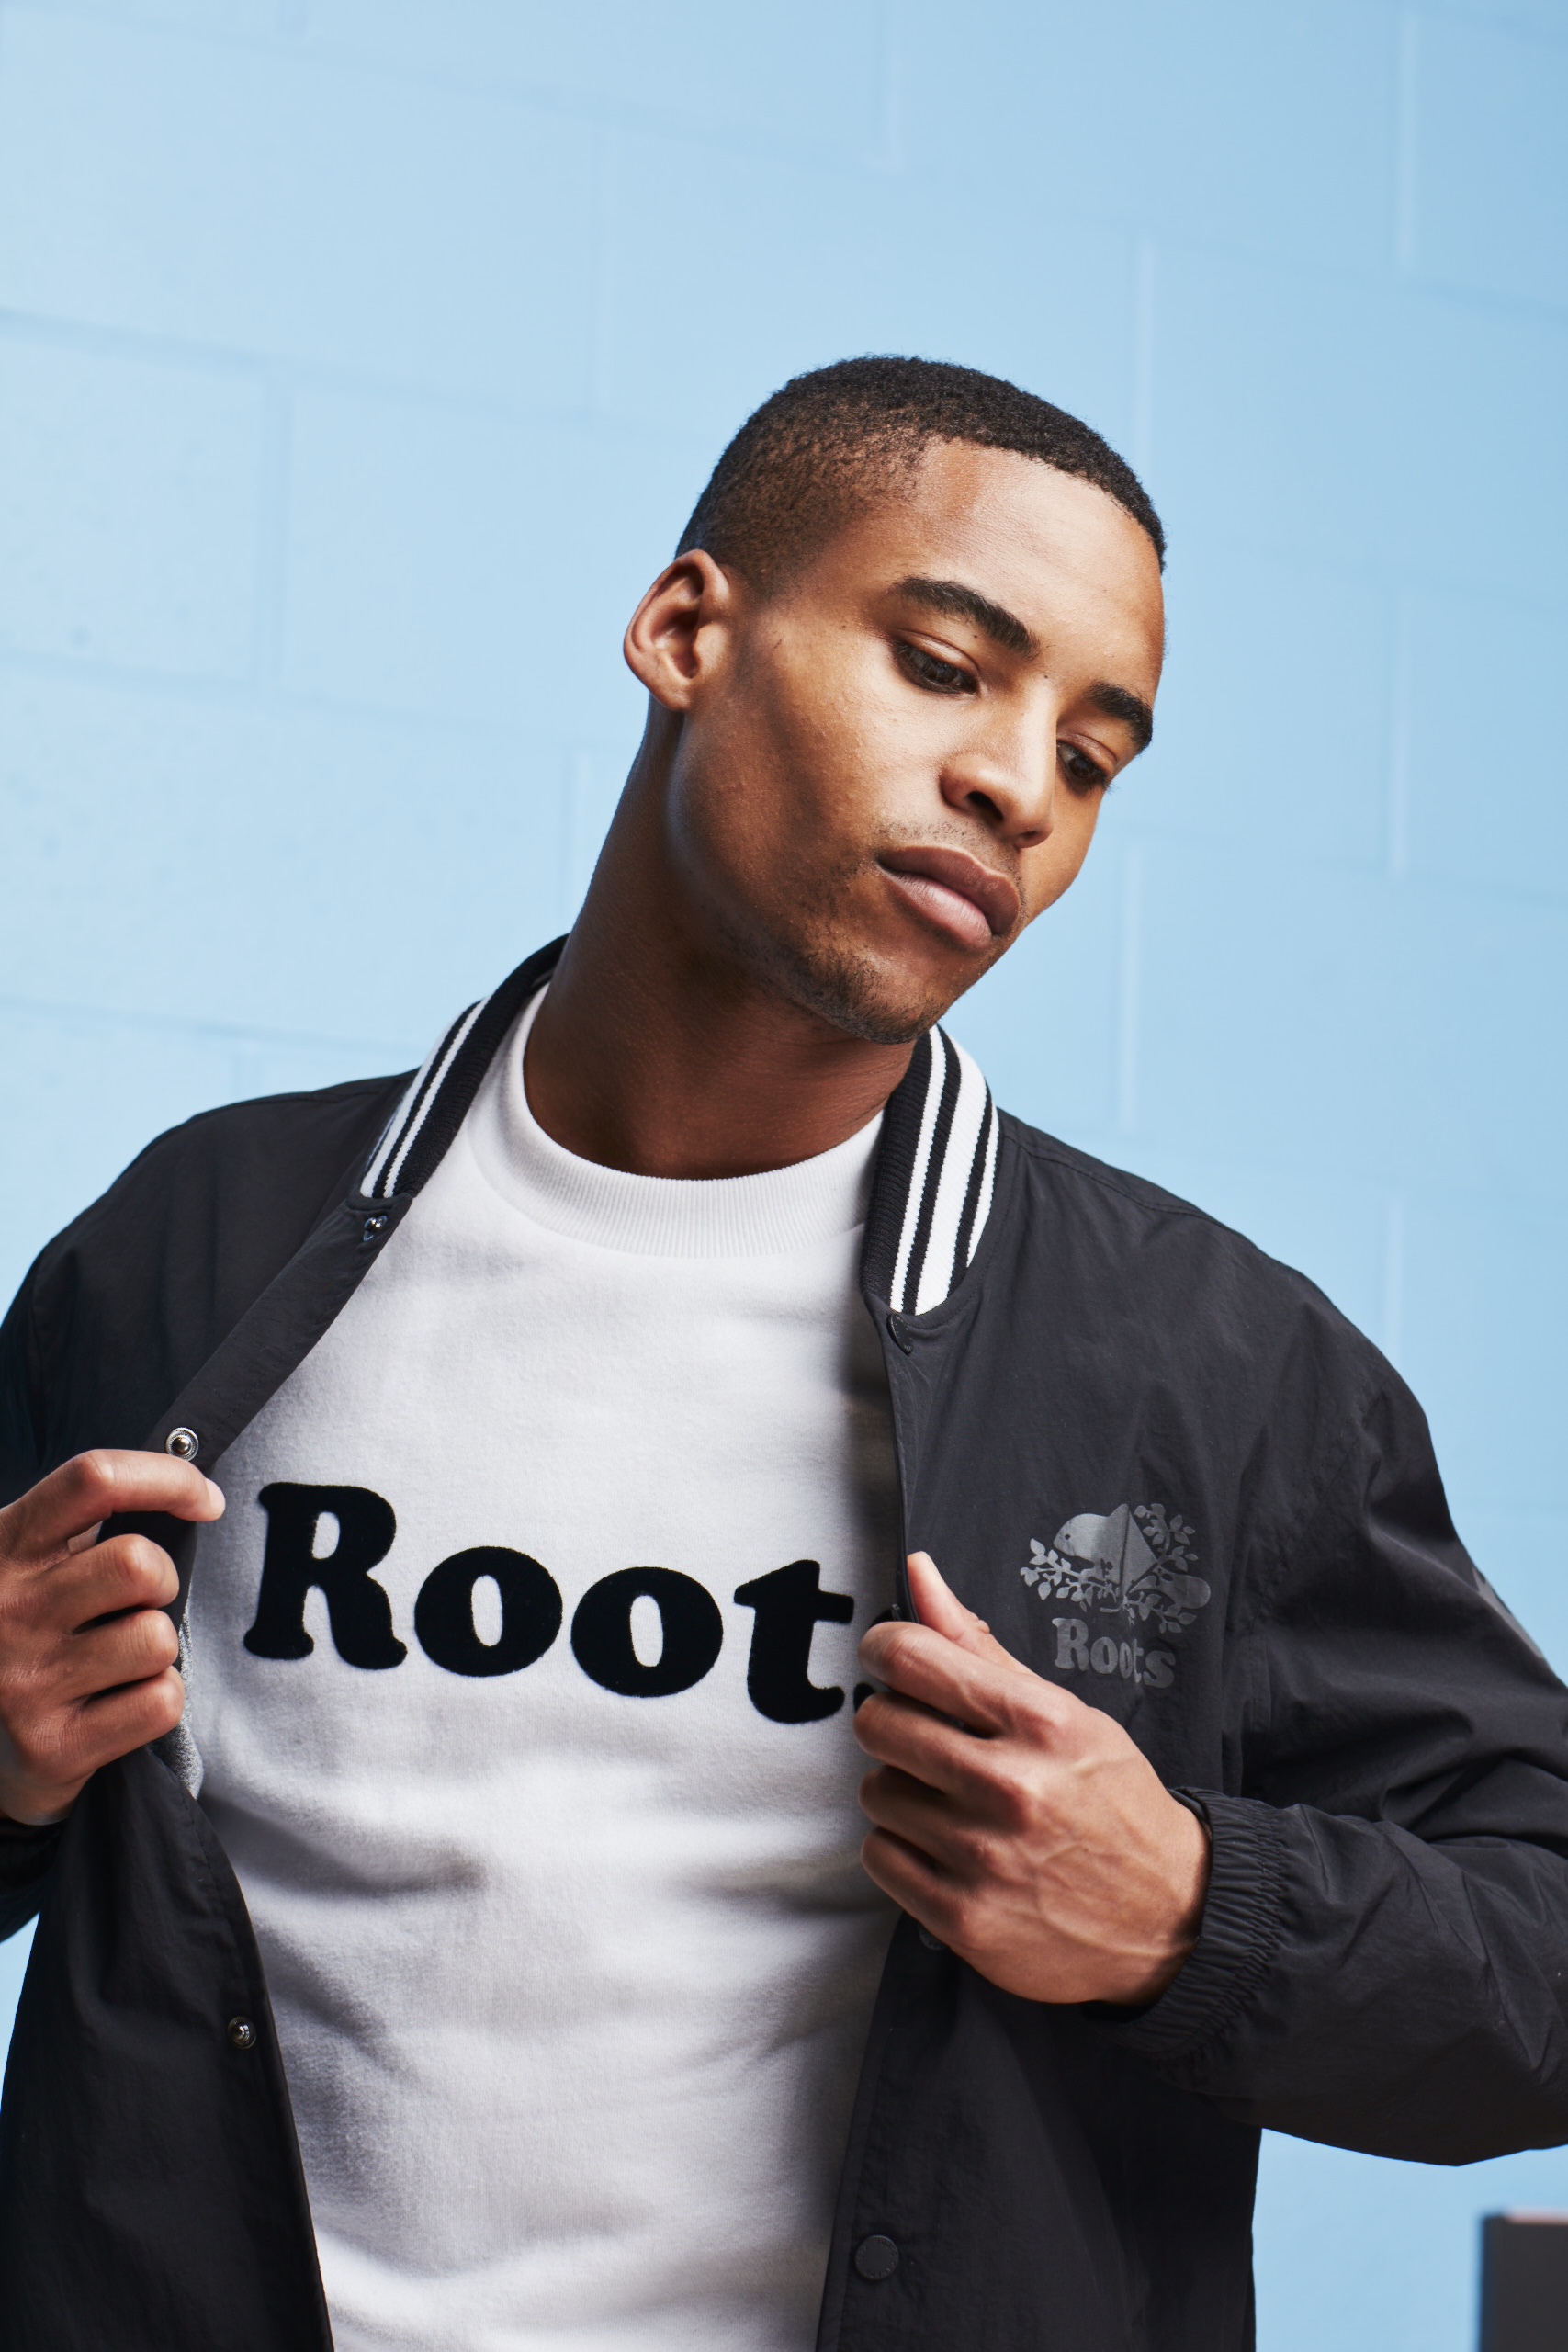 Roots-March-M_VarsityJ-0089.jpg